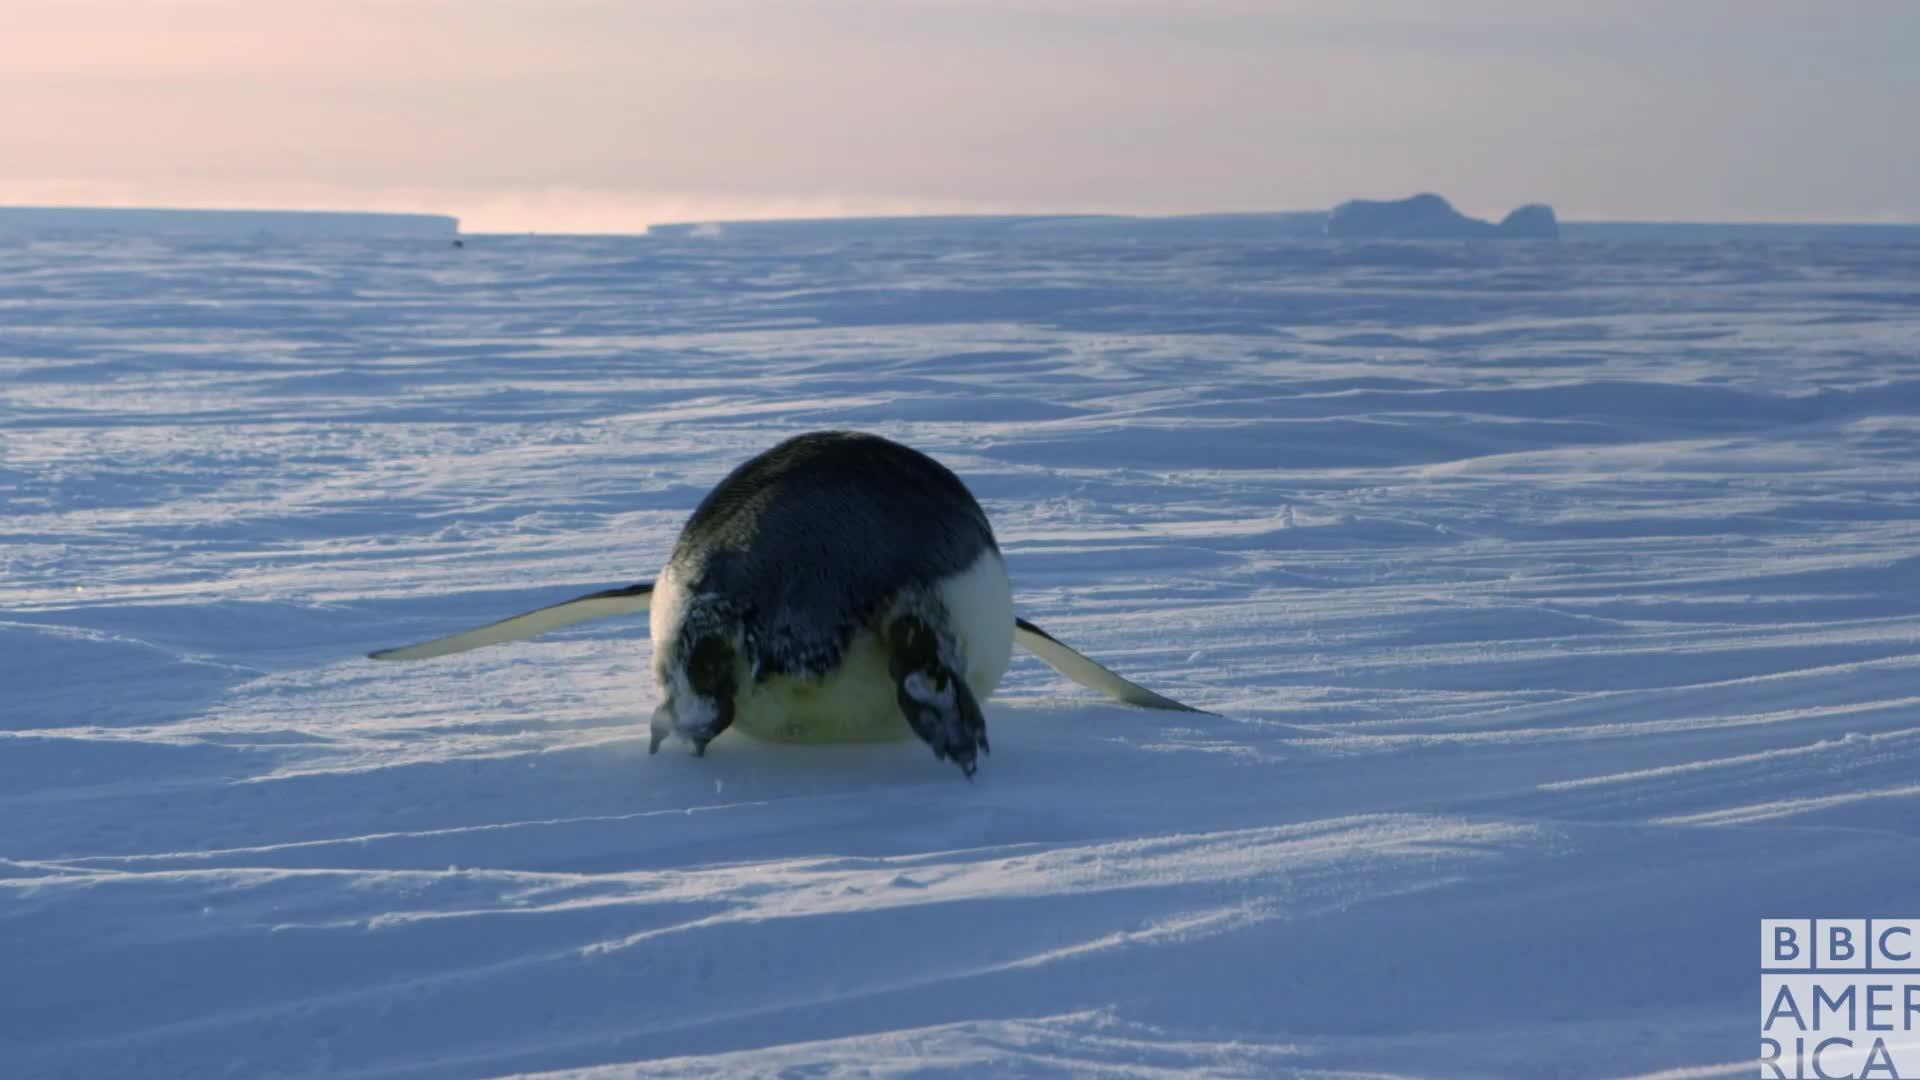 animal, animals, bbc america, bbc america dynasties, bbc america: dynasties, bye, dynasties, emperor penguin, emperor penguins, let's go, let's leave, peace, peace out, penguin, penguins, Dynasties Here I Go GIFs